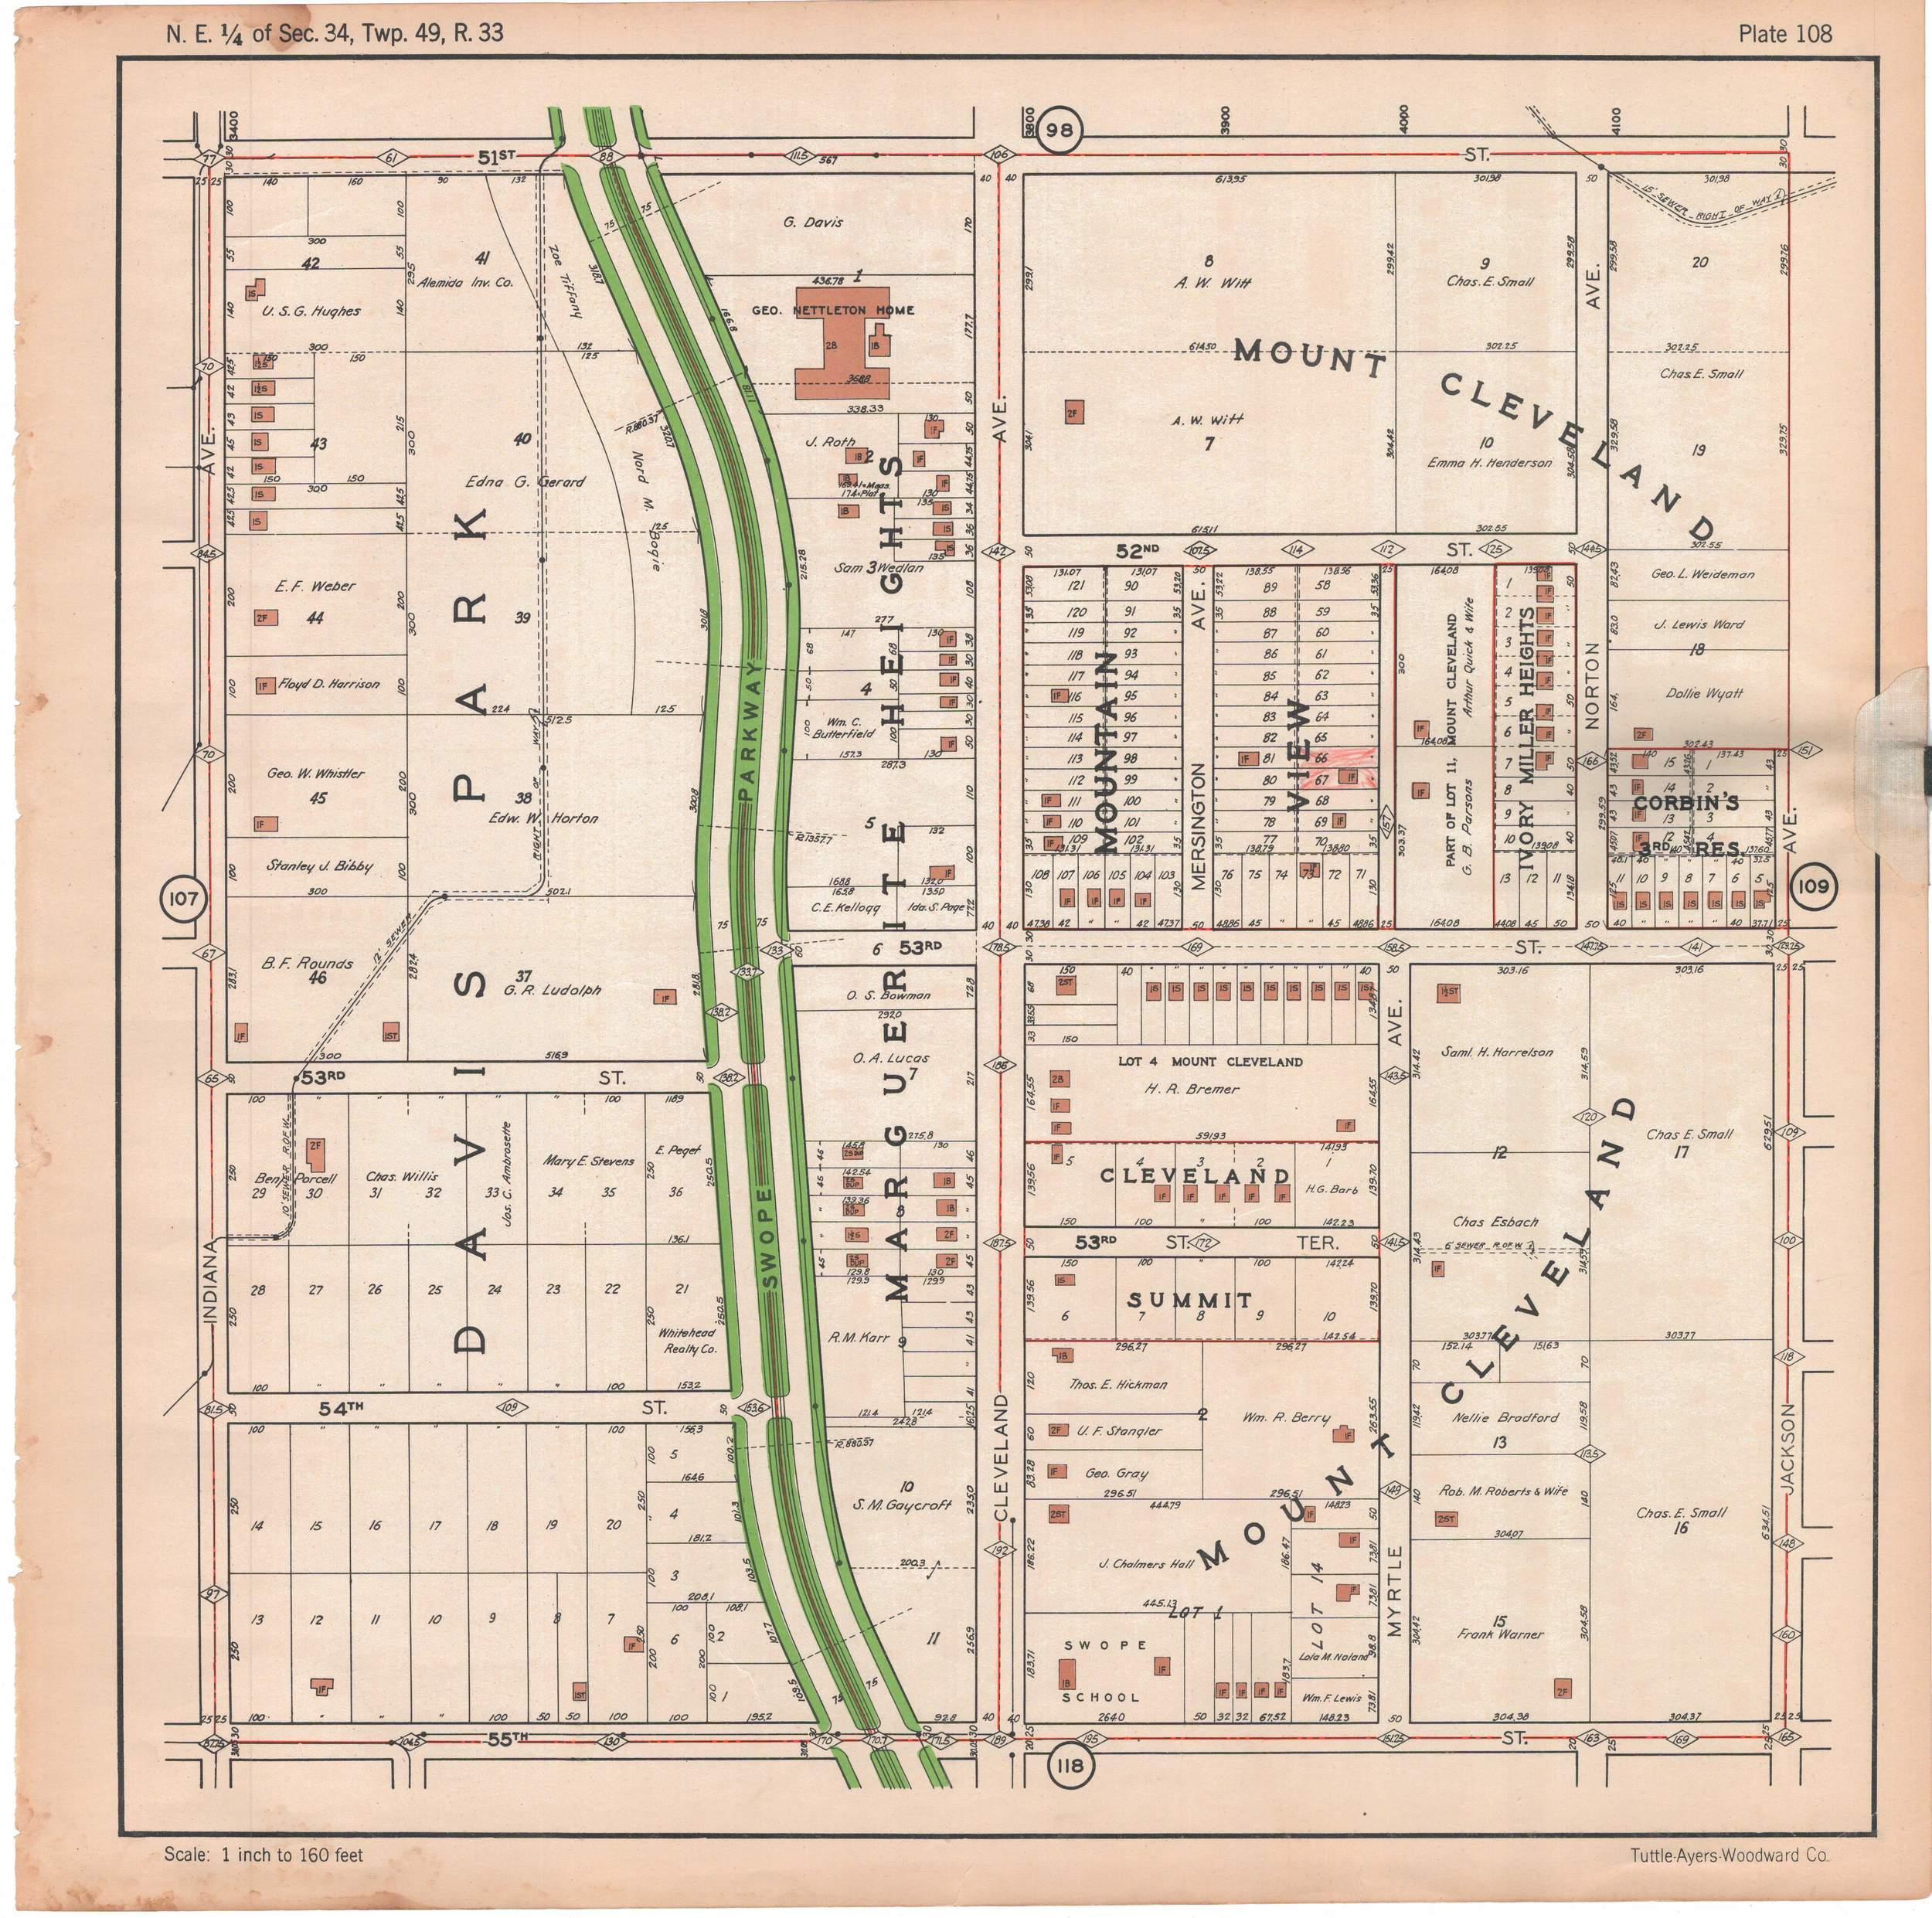 1925 TUTTLE_AYERS_Plate 108.JPG